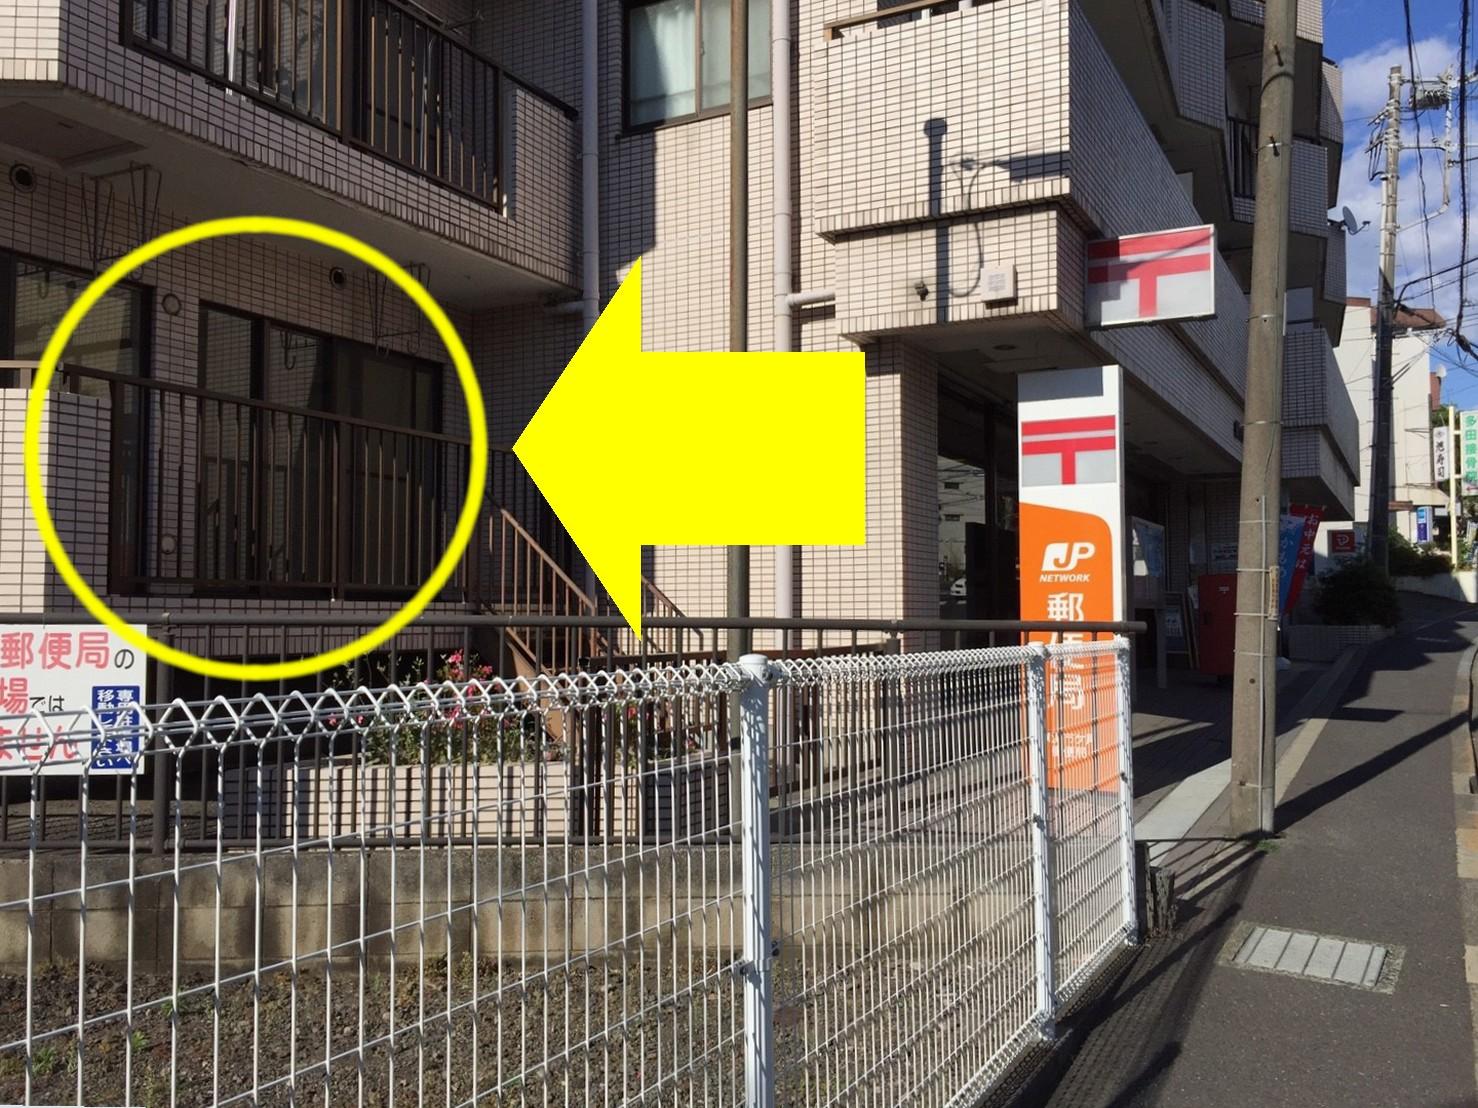 AsiaHome(エイジアホーム)は横浜市ヶ尾郵便局の隣に移転します